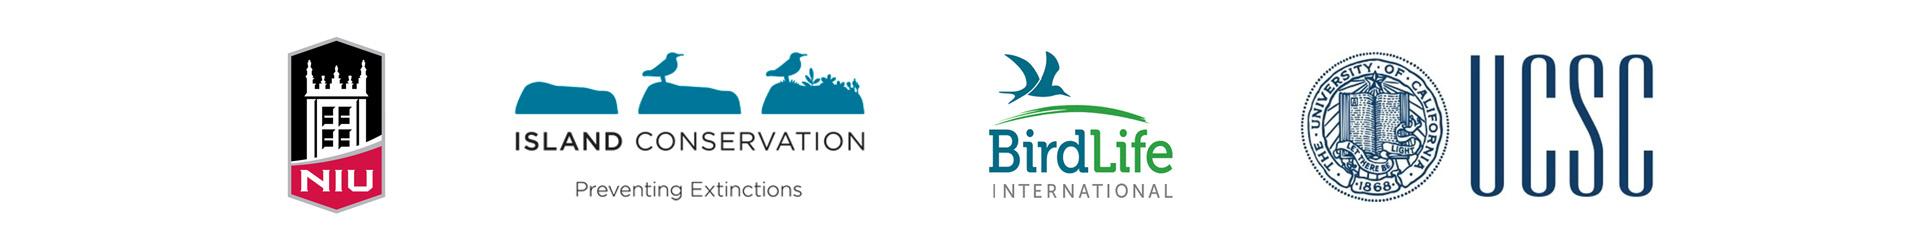 island conservation science UCSC NIU Birdlife International